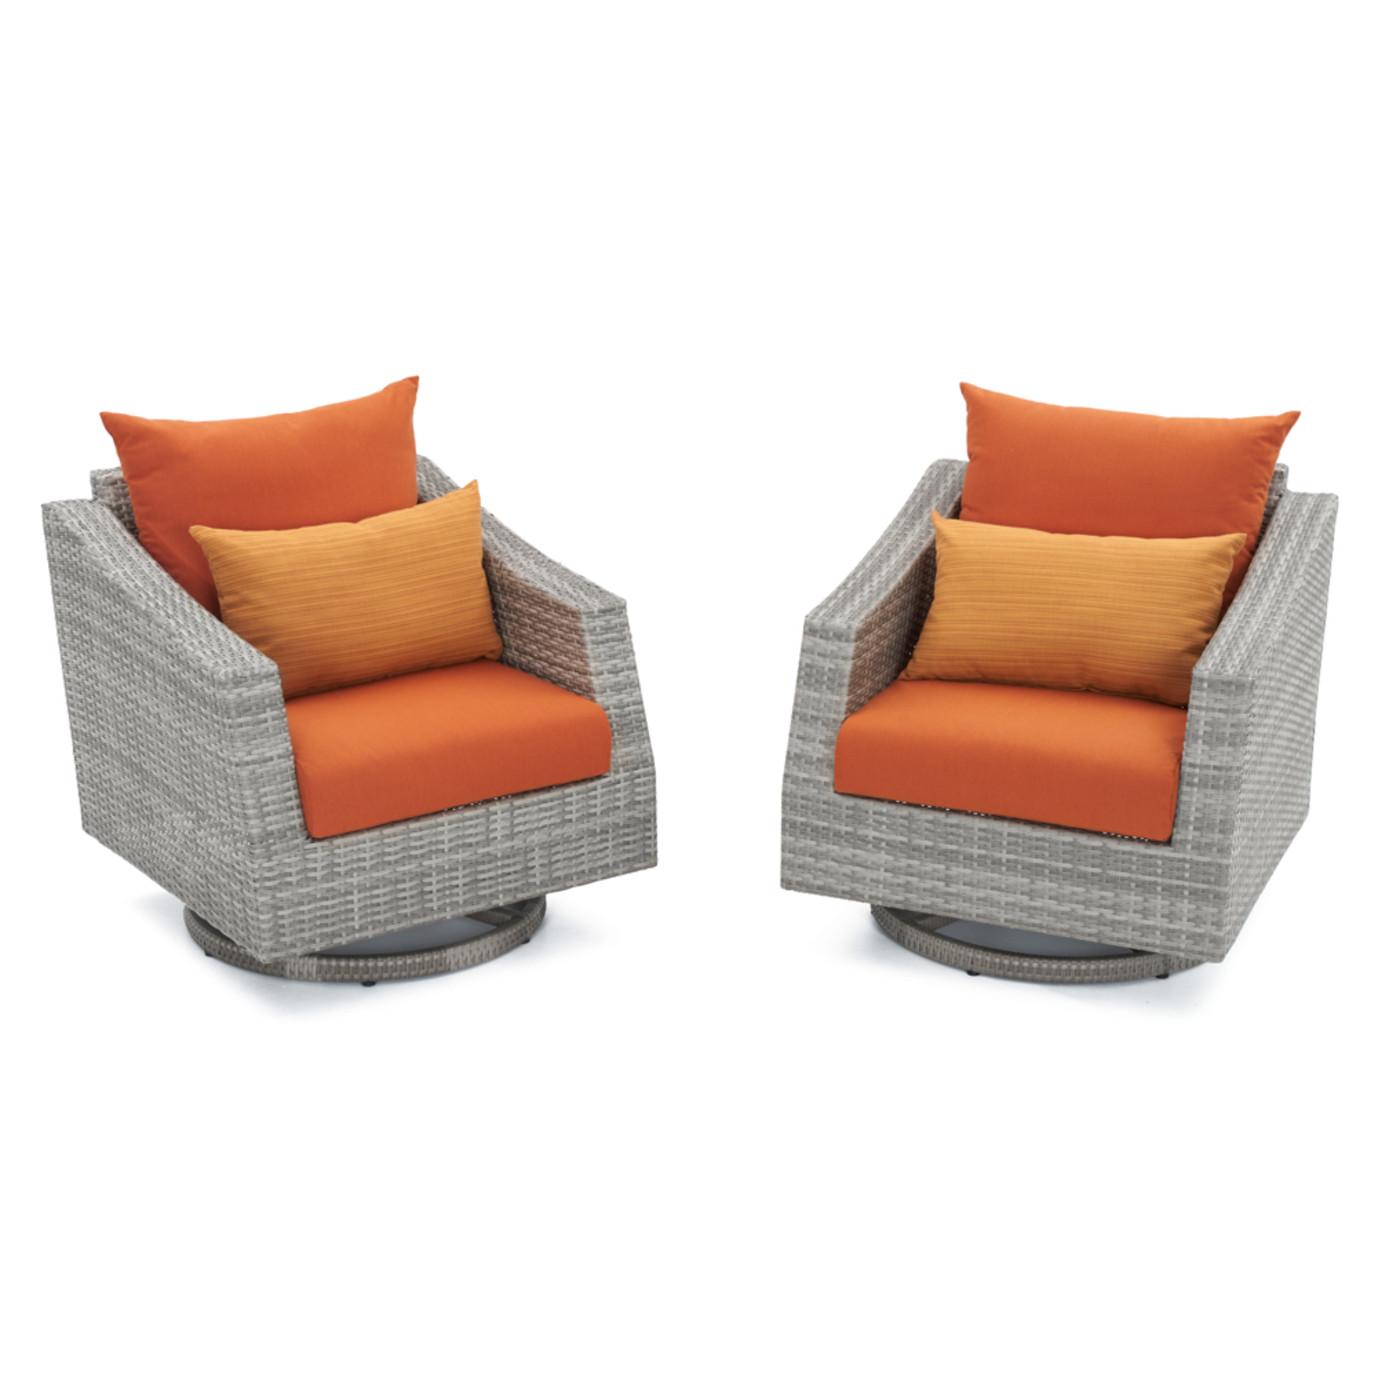 Cannes™ Motion Club Chairs - Tikka Orange